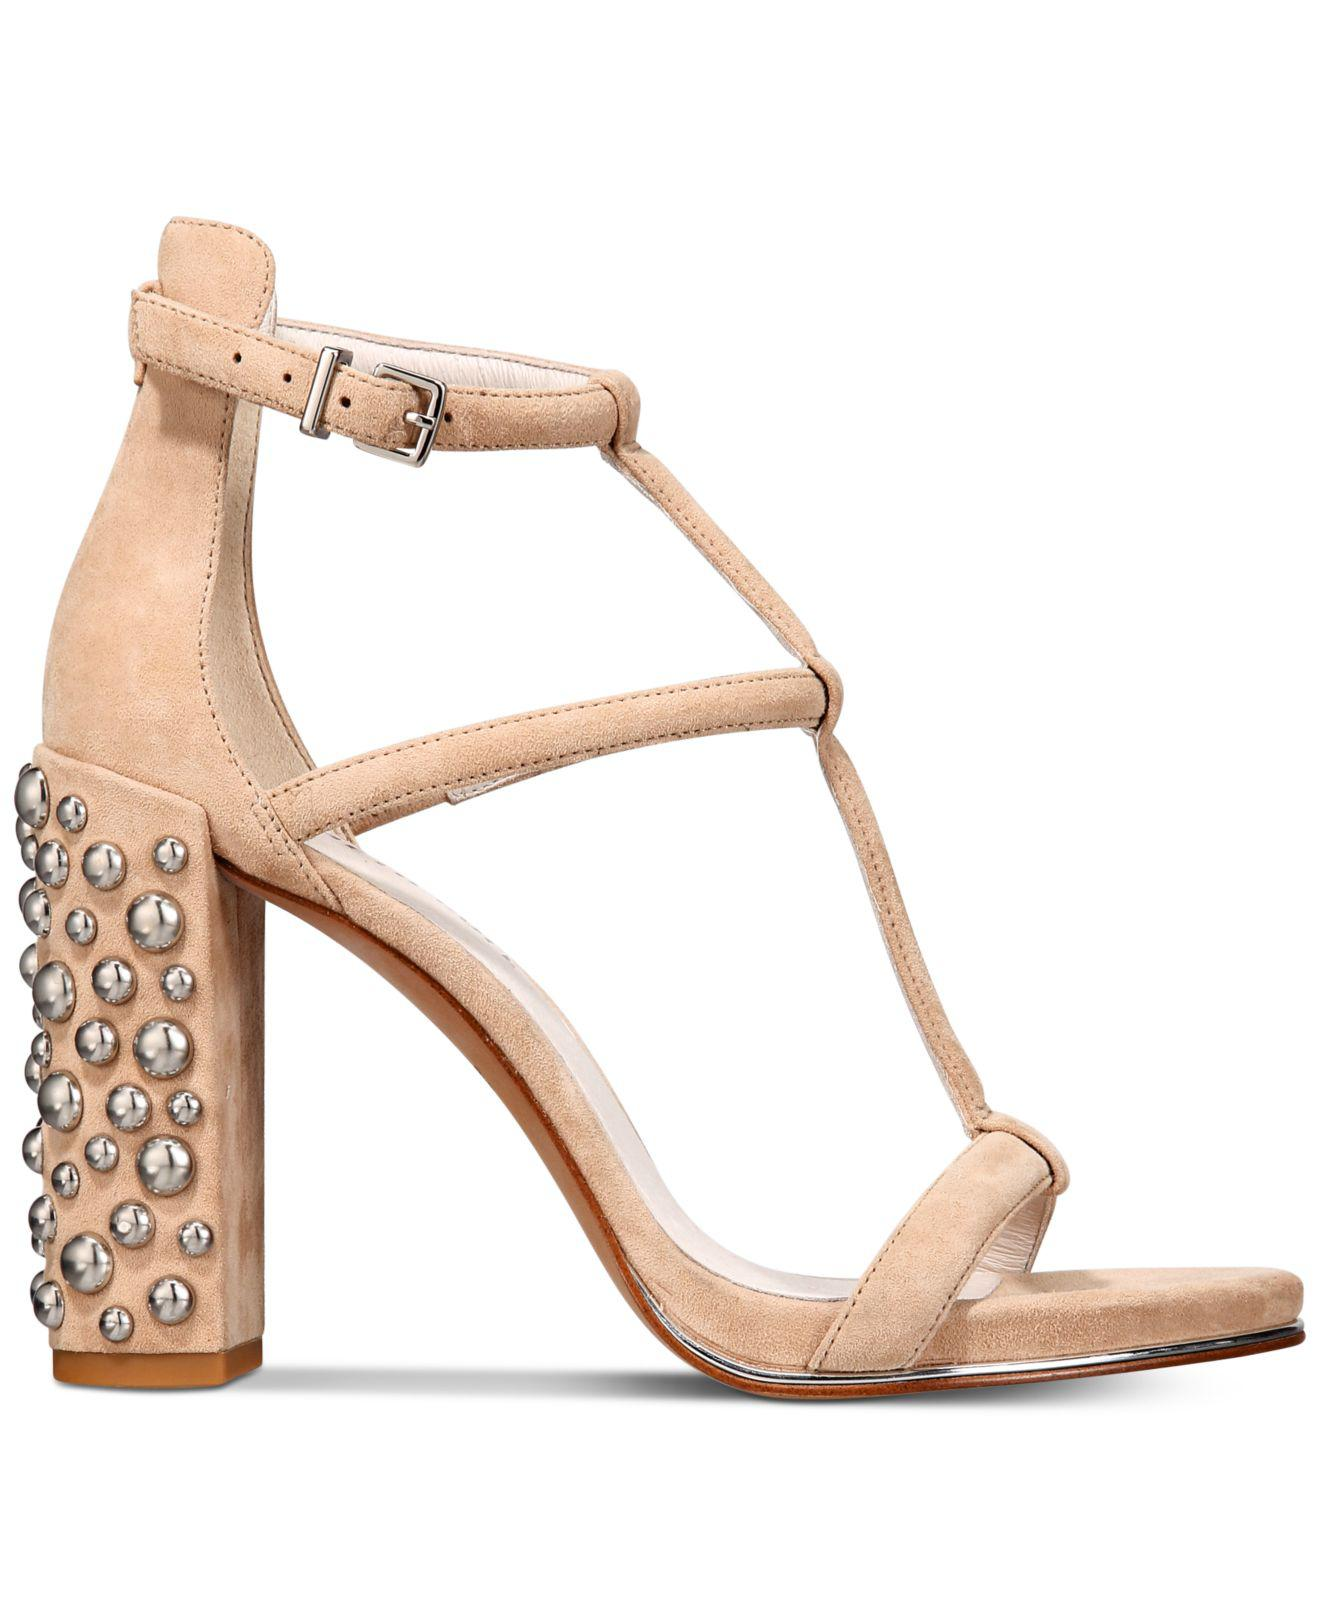 70da534e9f9 Lyst - Kenneth Cole Deandra Studded Dress Sandals